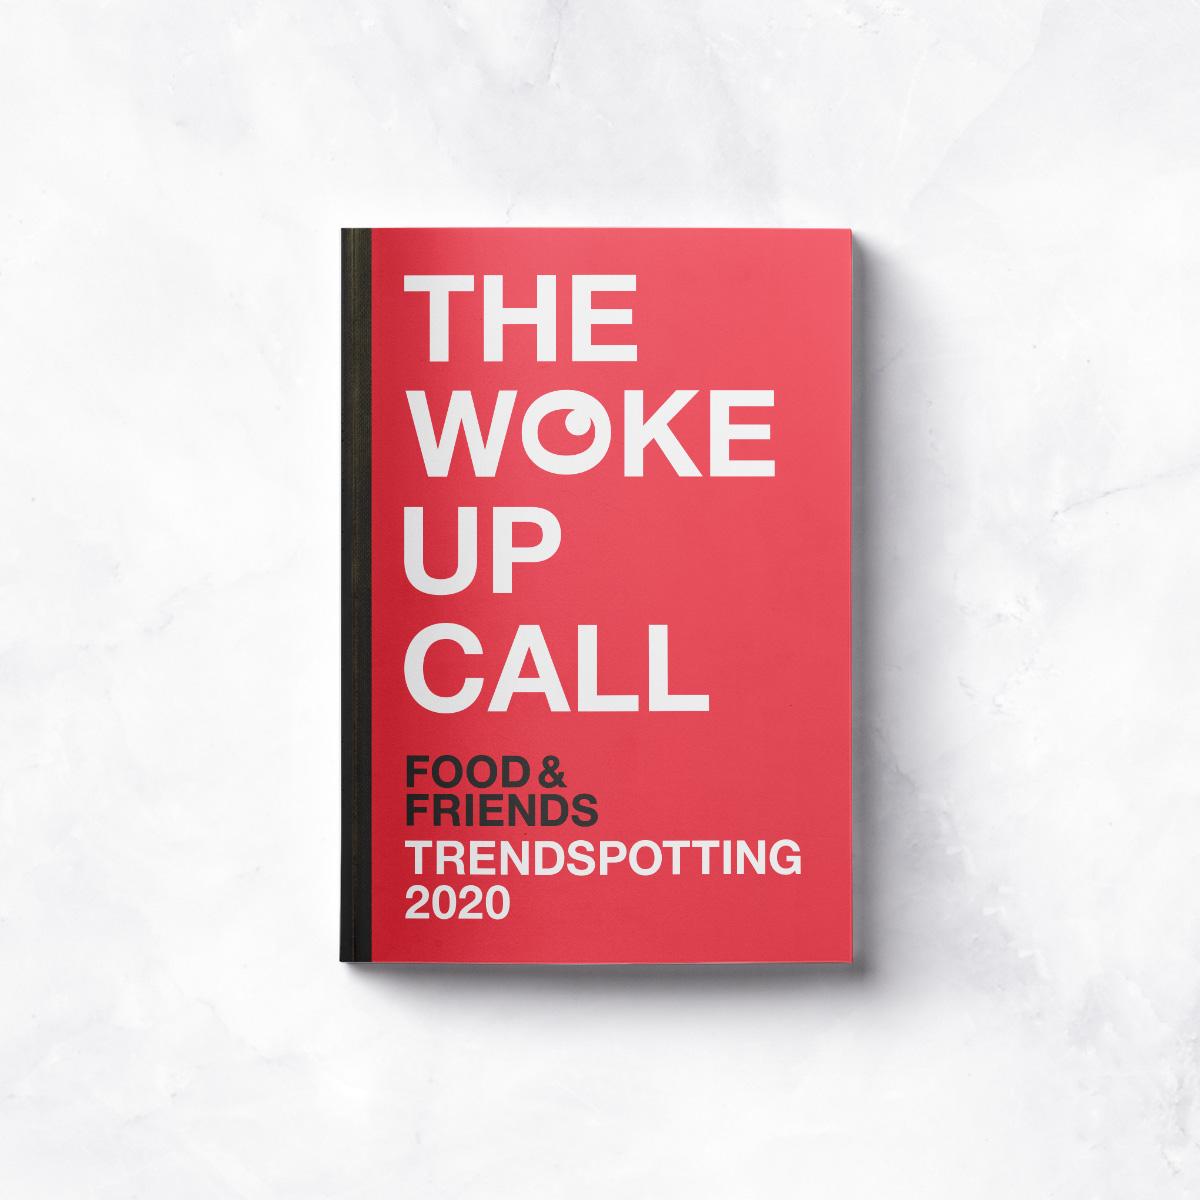 Trendspaning 2020